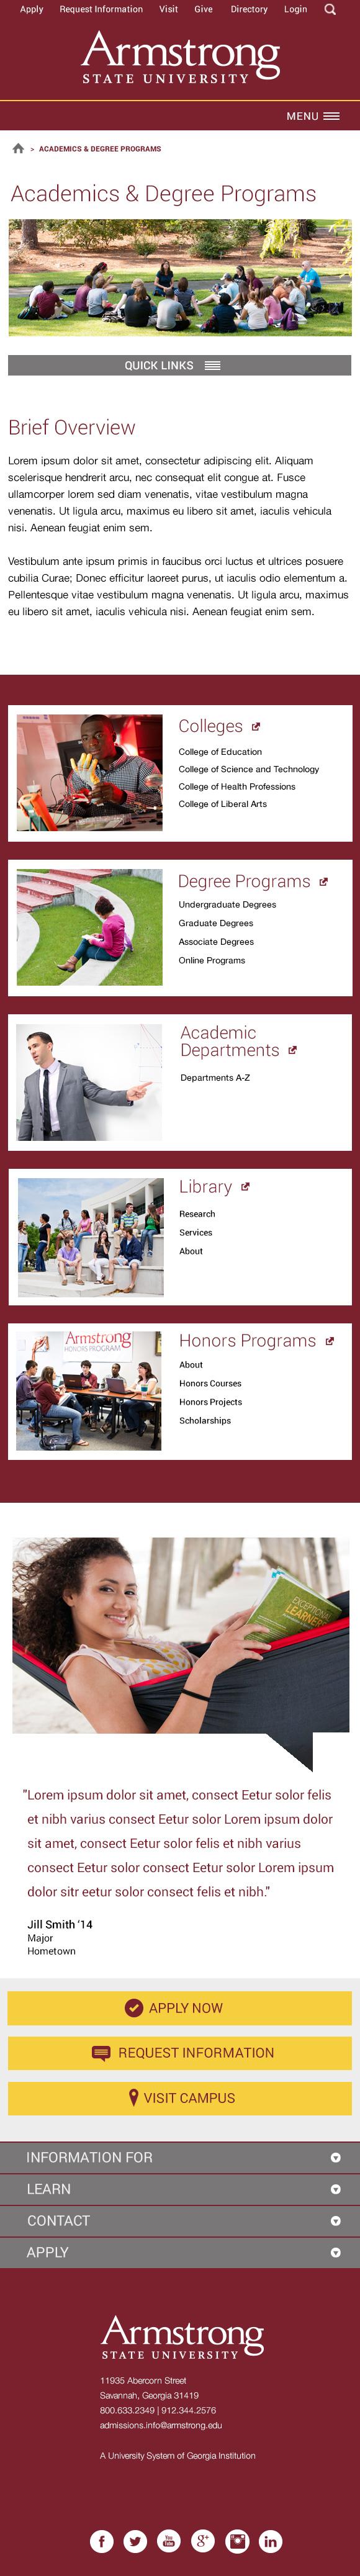 Armstrong-Tier1-AcademicsDegreePrograms-580px